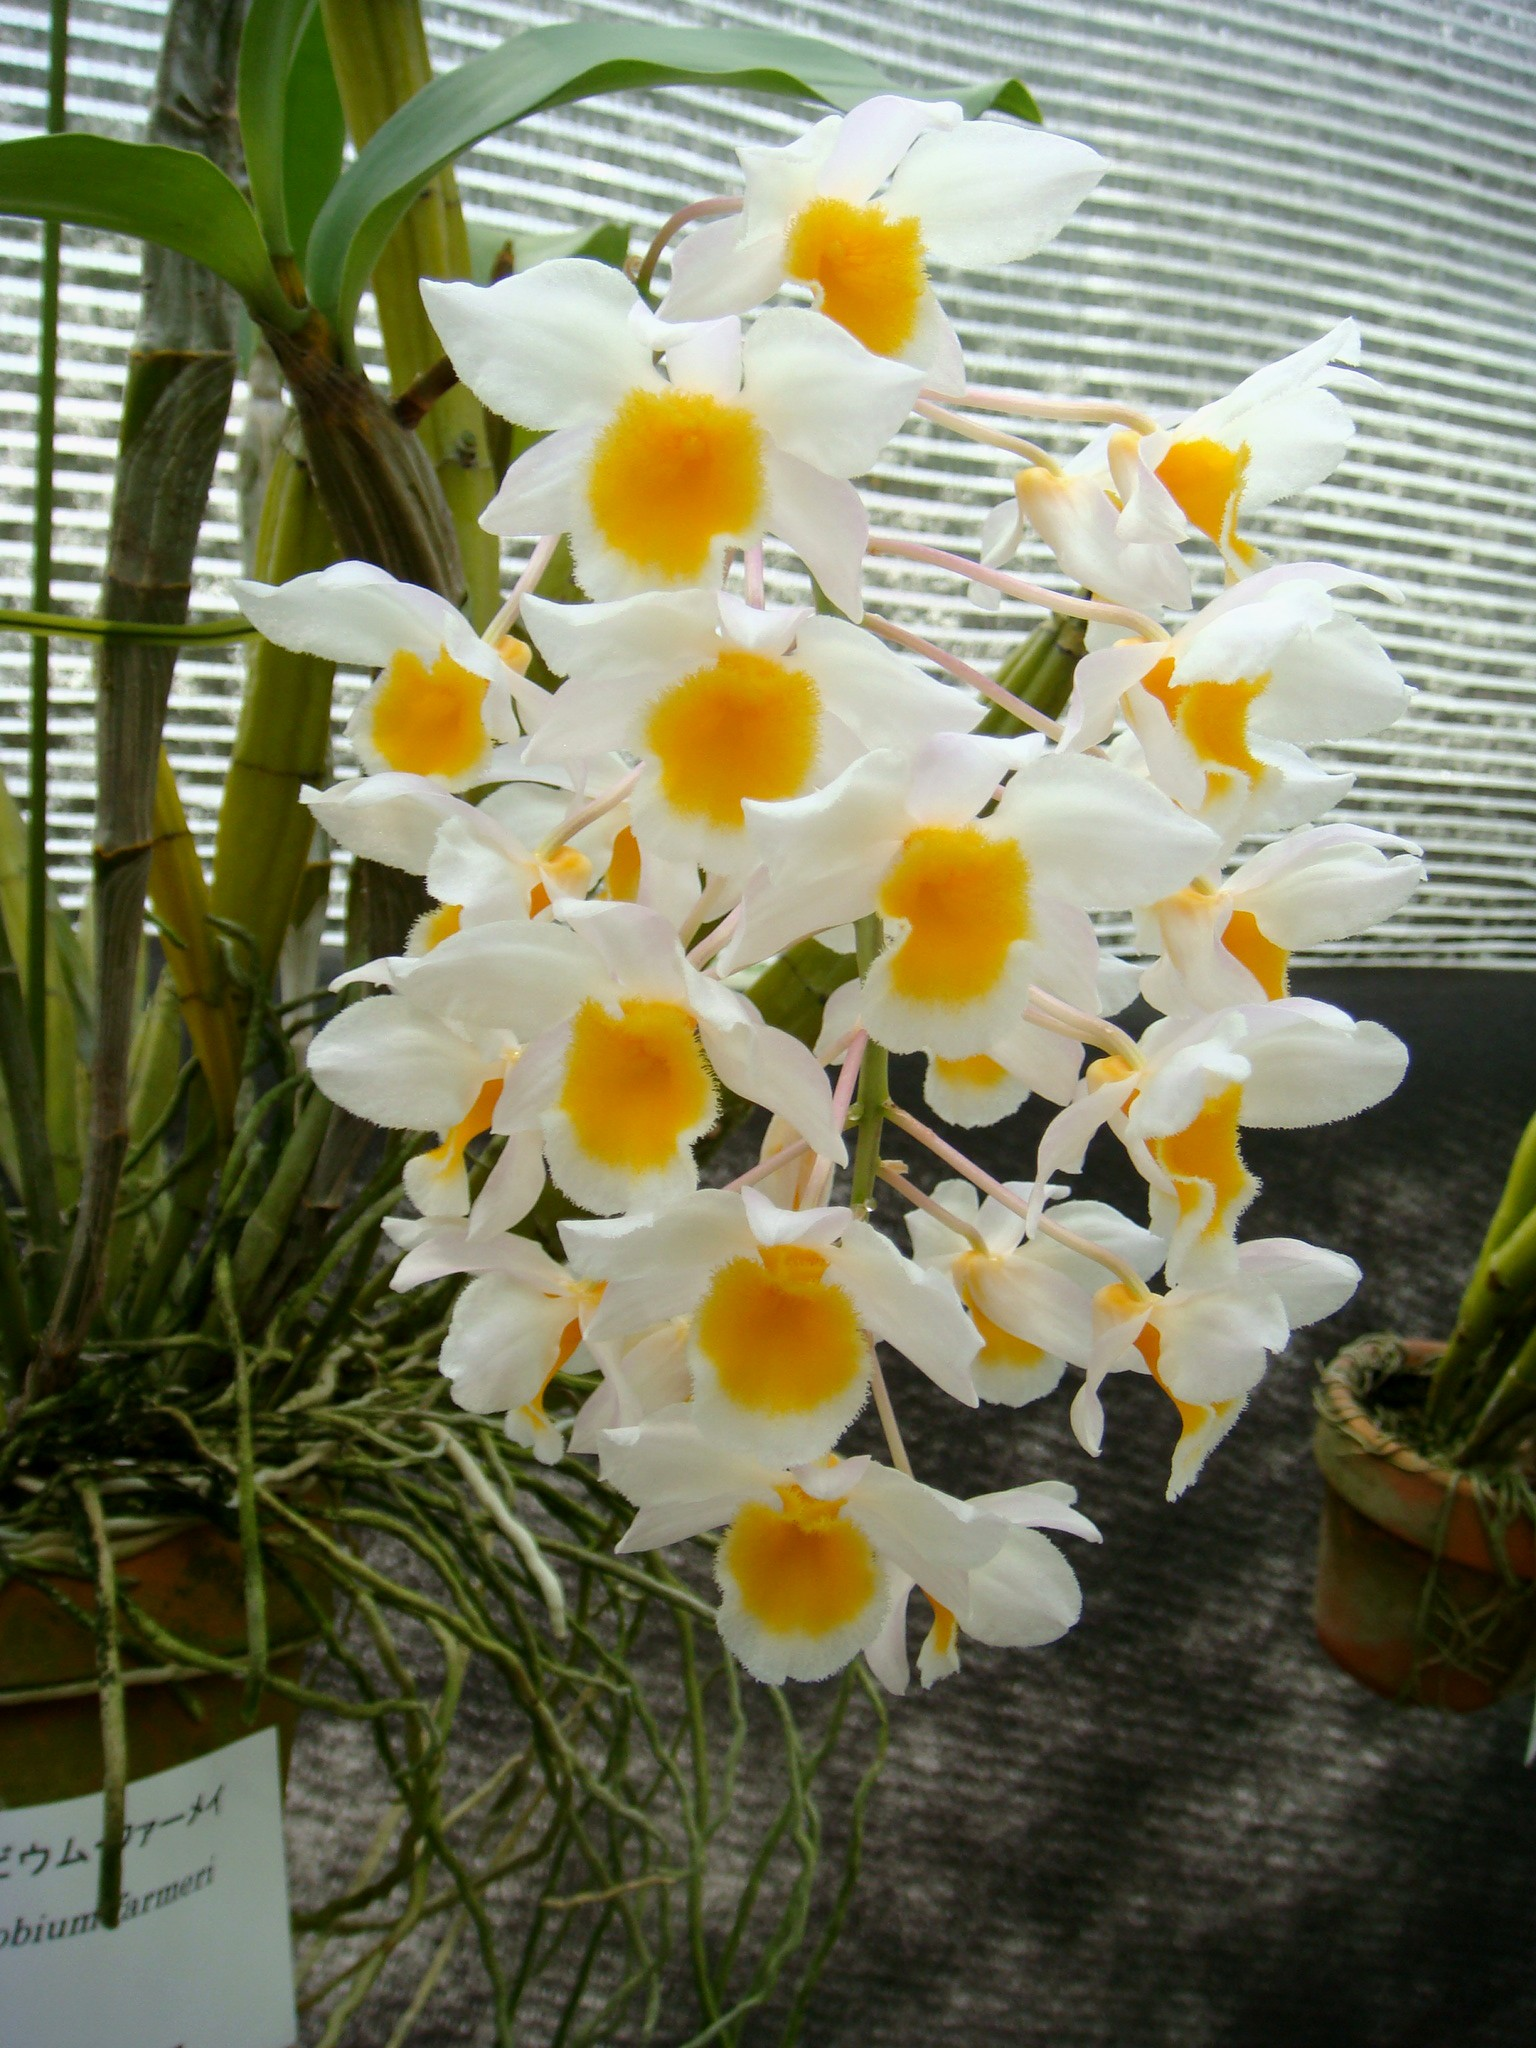 http://orchids.la.coocan.jp/Dendrobium/Dendrobium%20farmeri/DSC05866.JPG